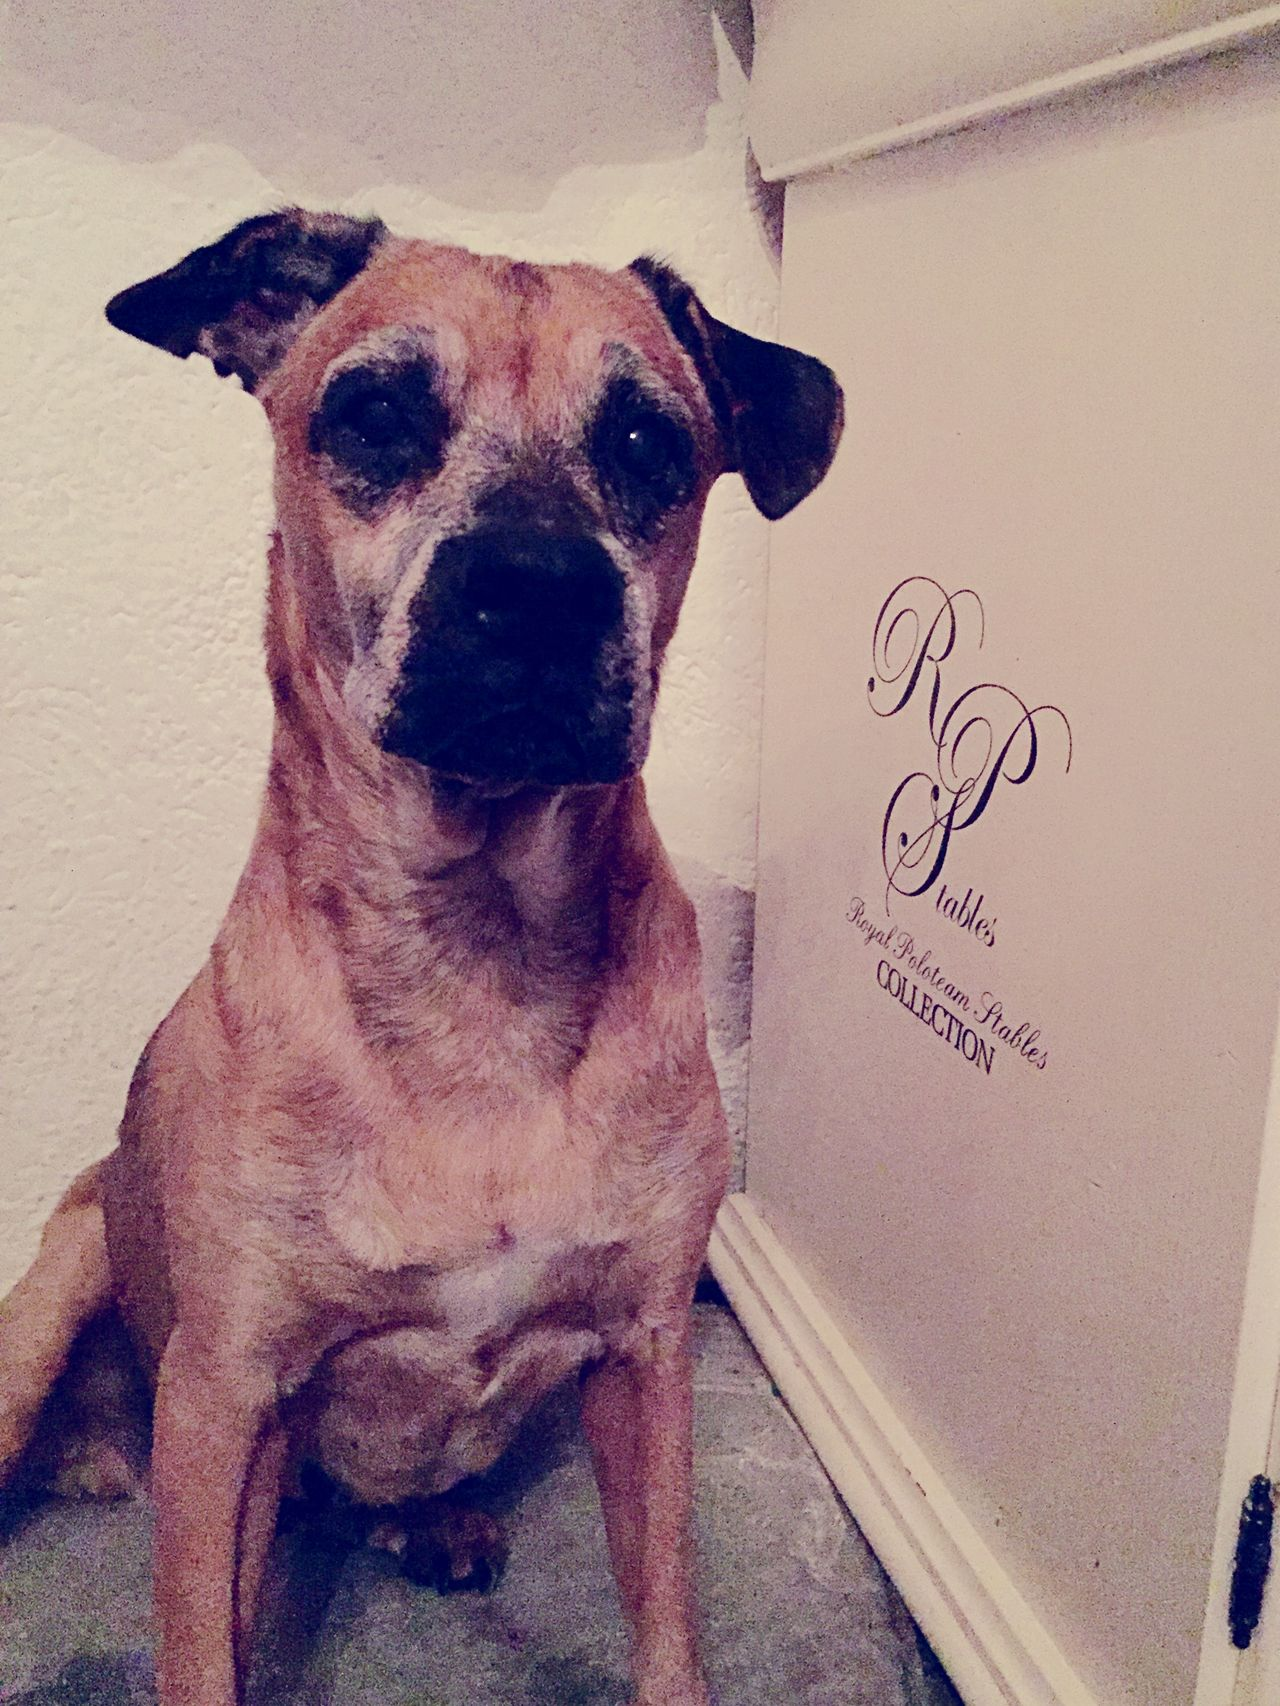 I Love My Dog Old Dog Grey Grumpy Sweet Love Dogs Of EyeEm IPhoneography Taking Photos Hollandsnextdogmodel